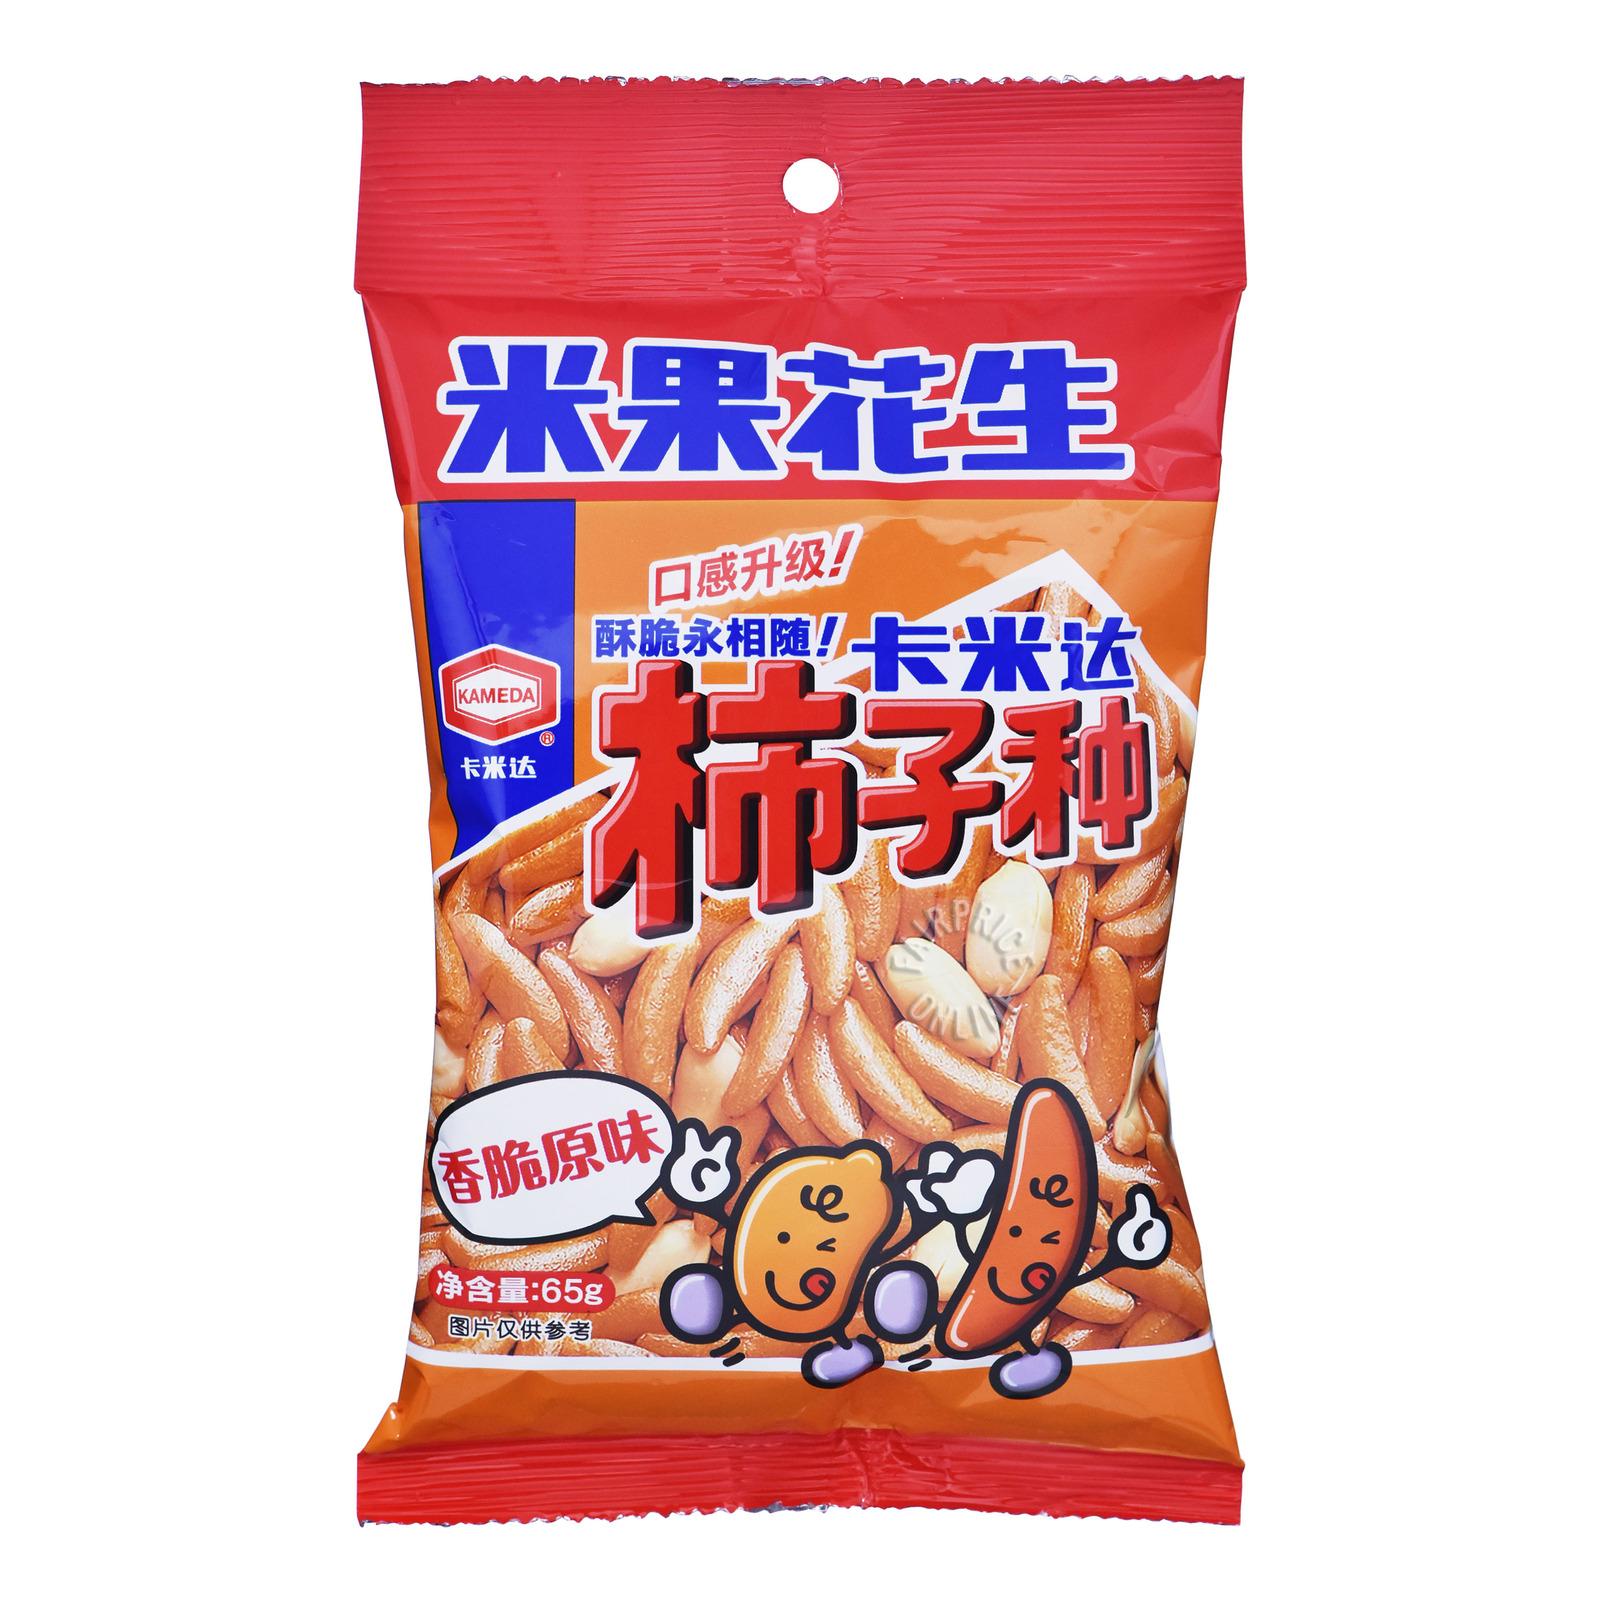 Kameda Persimmon Seed - Original